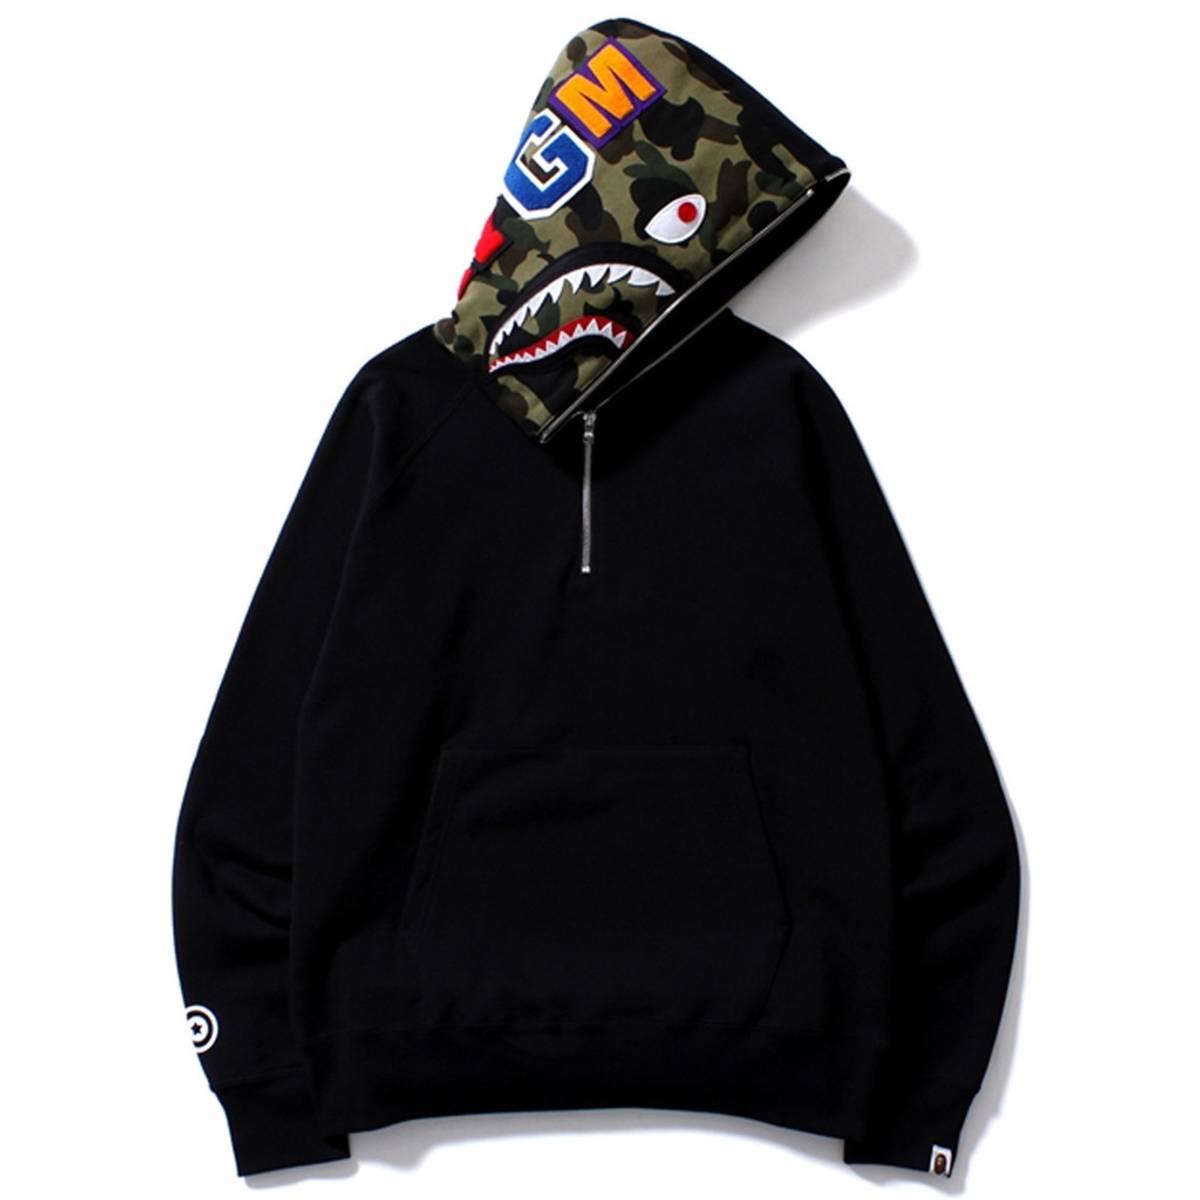 9c2b8393938a Bape Half-Zip Sweat Shark Hoodie Black - Bape L Size l - Sweatshirts    Hoodies for Sale - Grailed